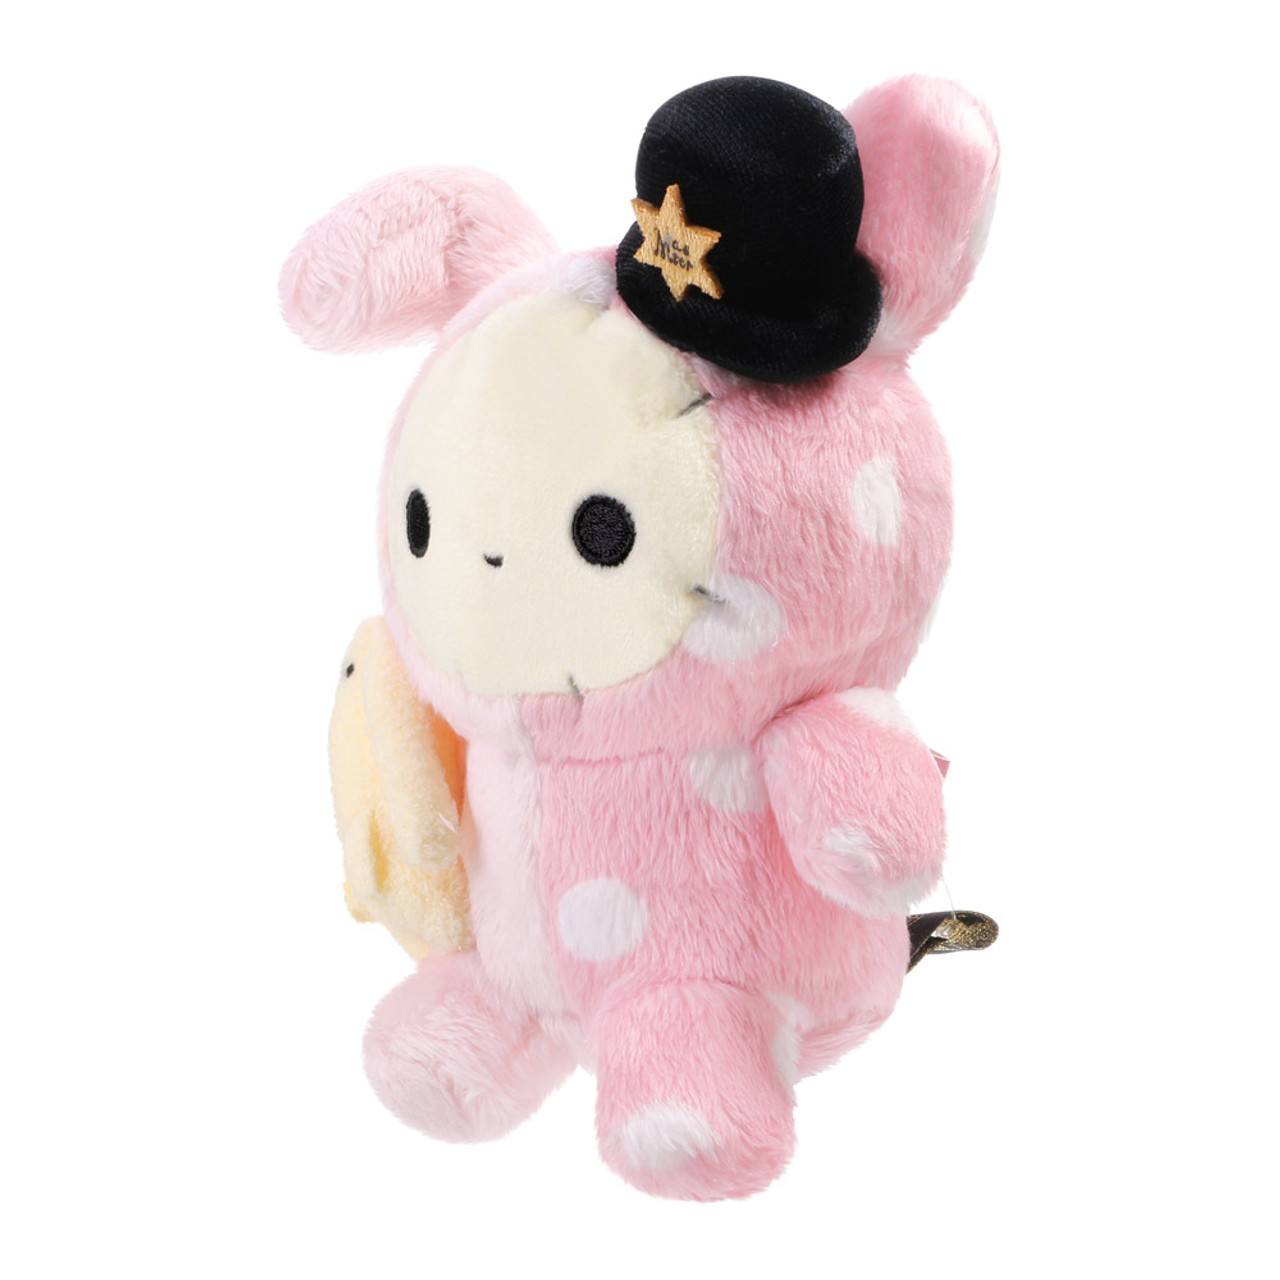 Sentimental Circus Plush Doll - Shappo & Toto ( Side View )